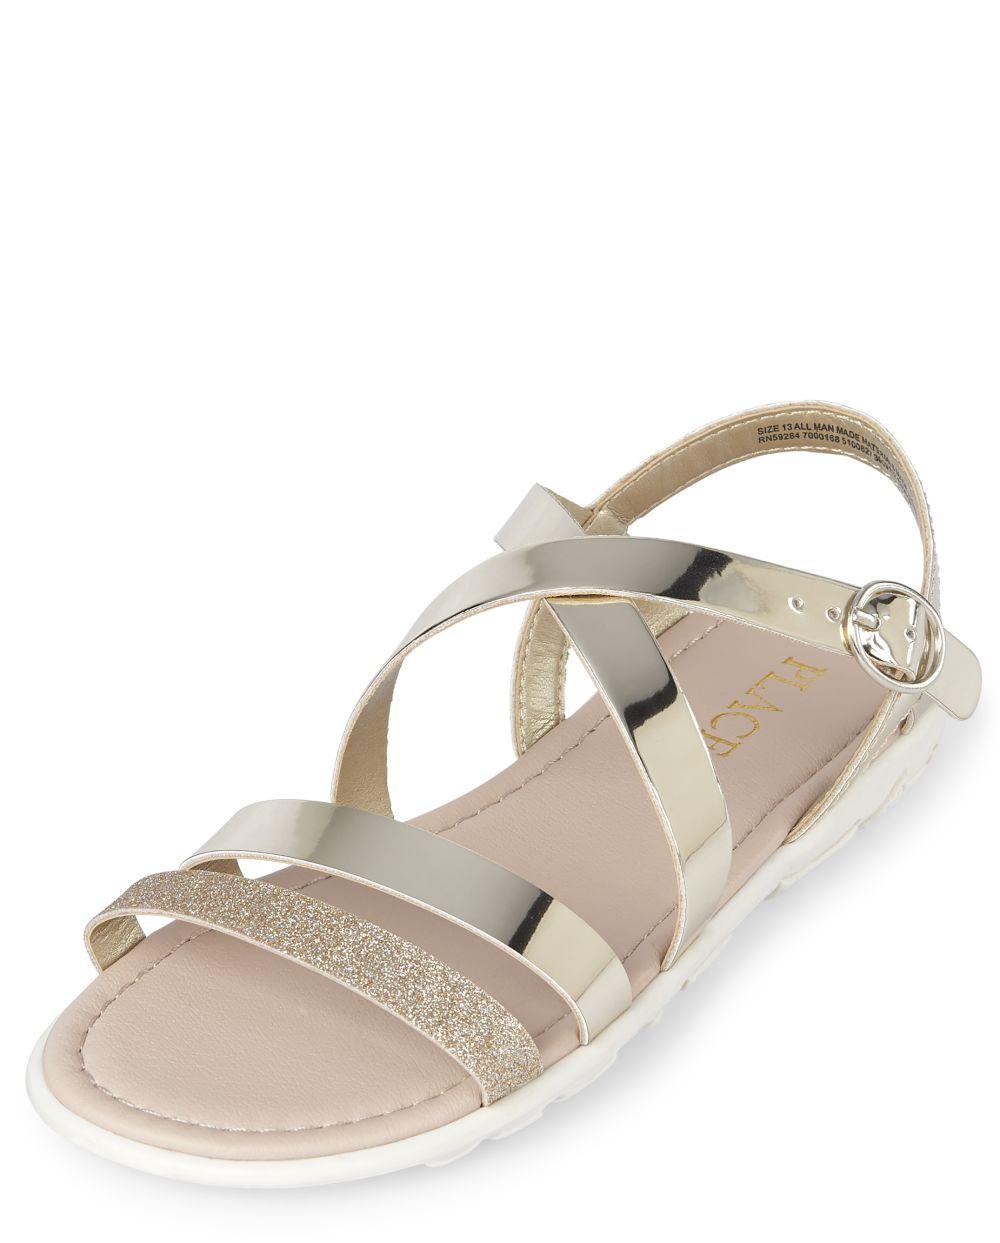 Girls Cross Strap Sandals